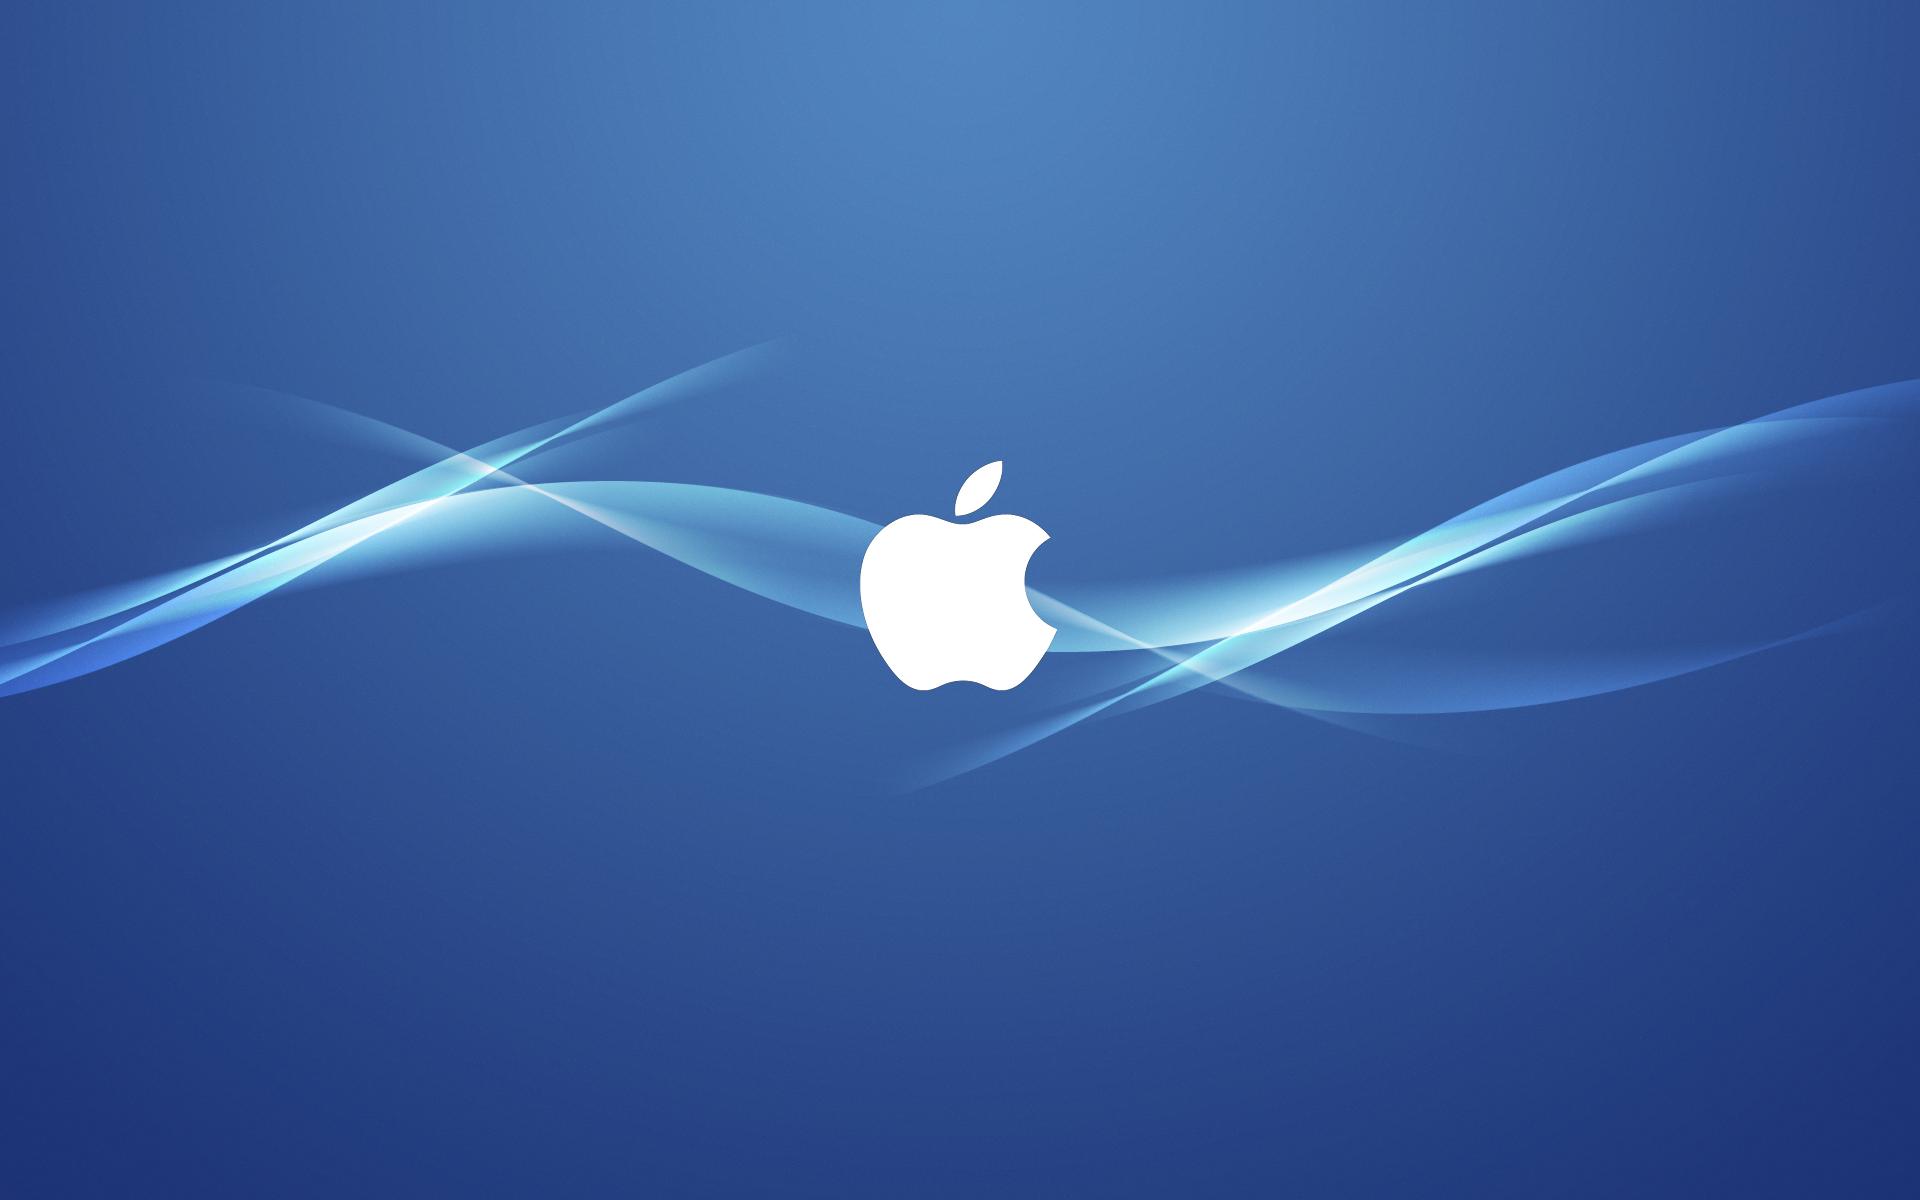 Wallpaper download apple - Hd Apple Wallpaper